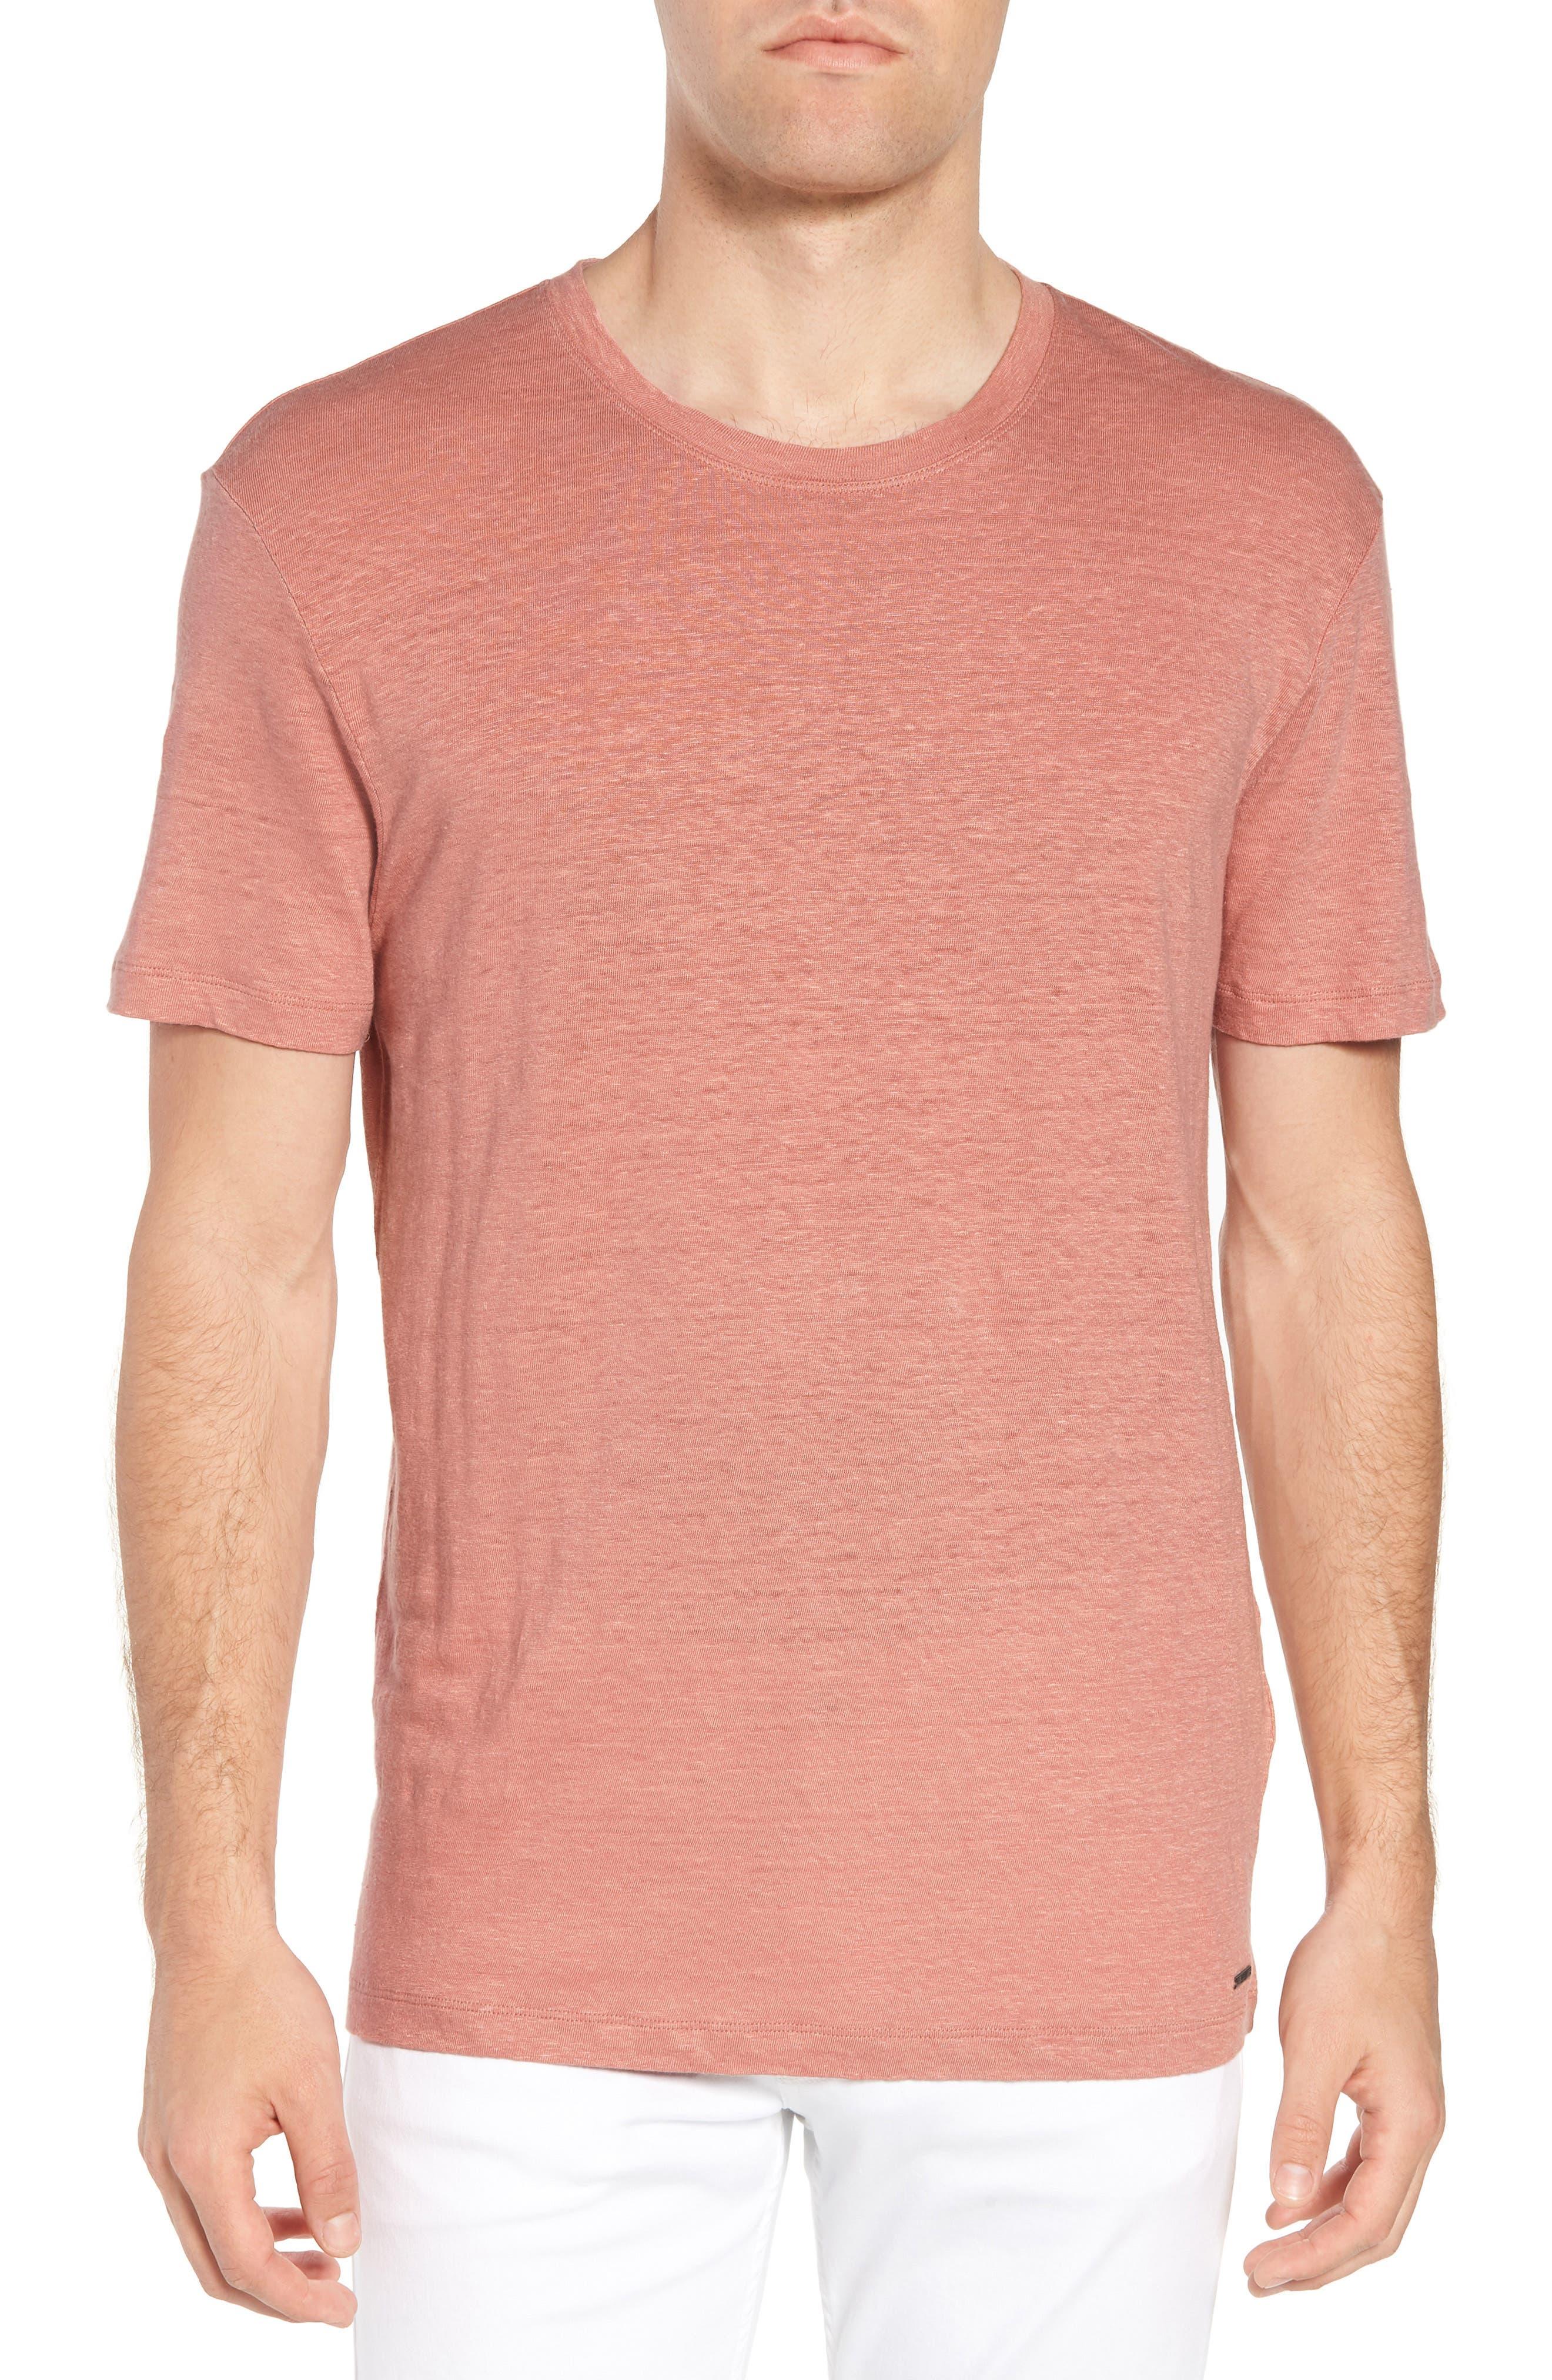 Hugo Boss Tiburt Linen T-Shirt,                             Main thumbnail 1, color,                             631